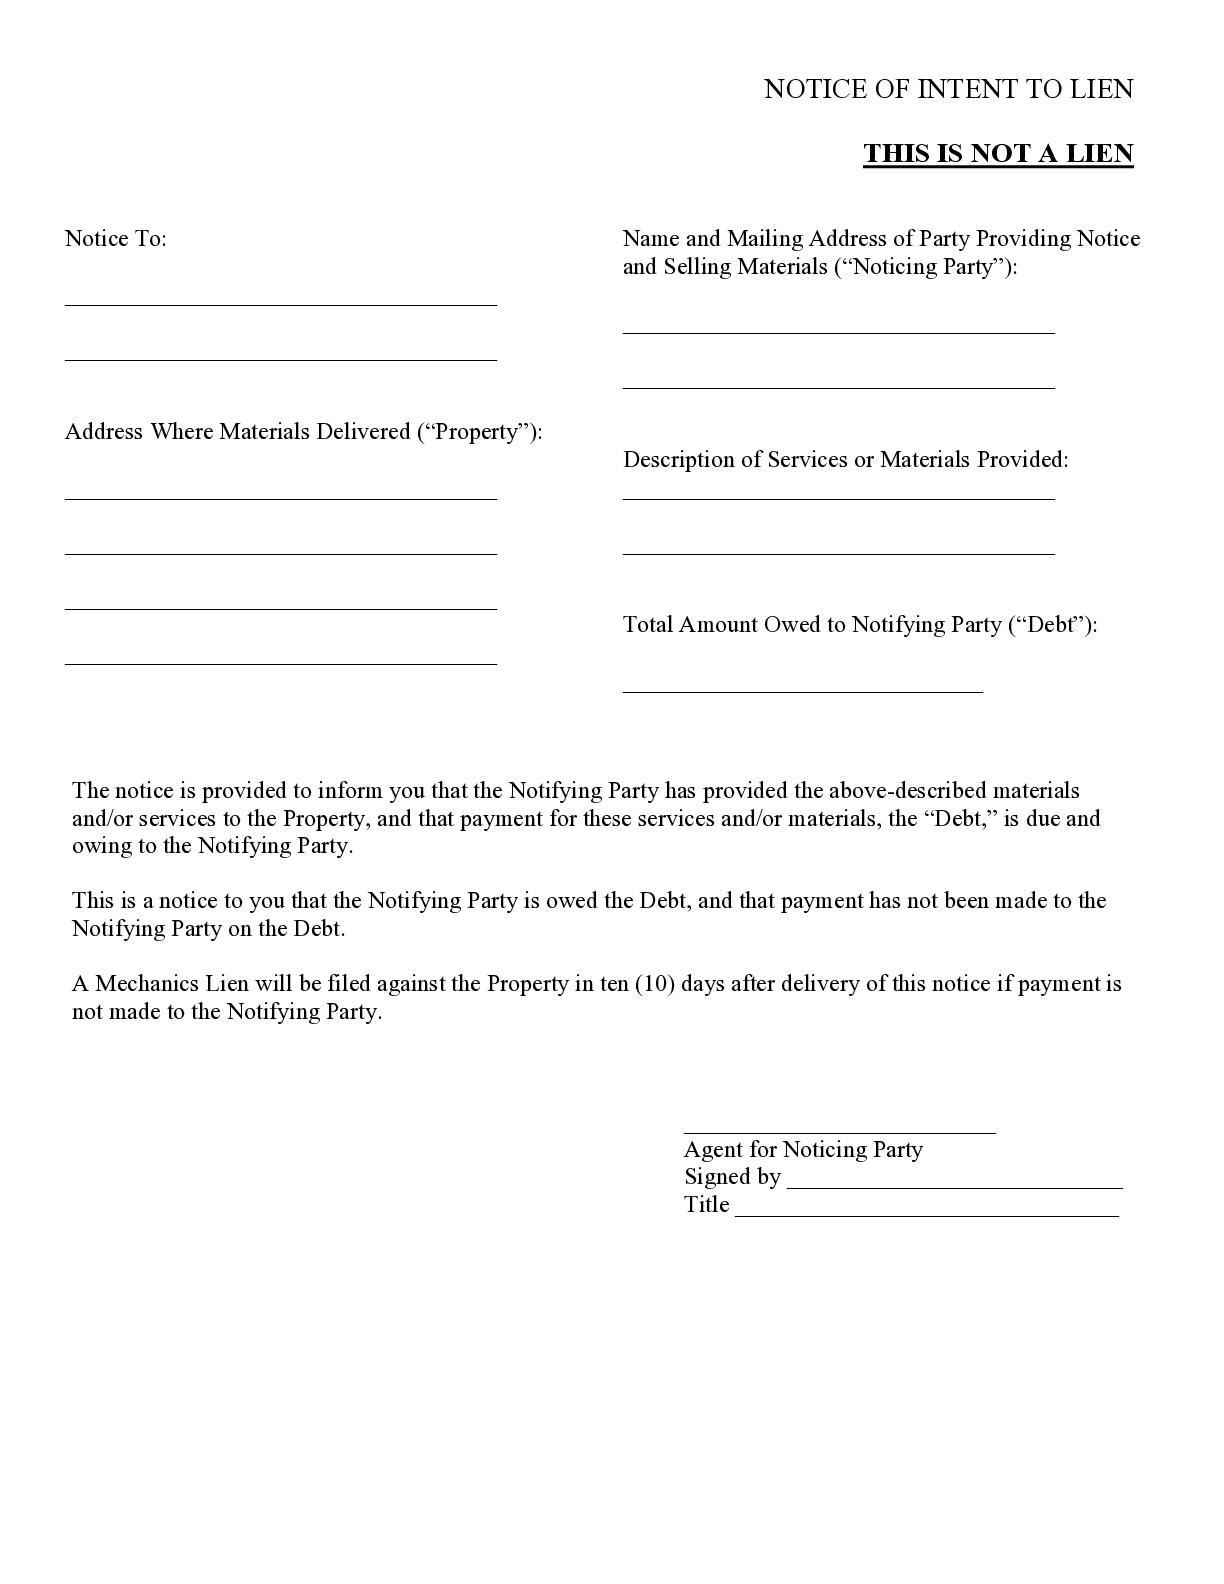 Virginia Notice Of Intent To Lien Form